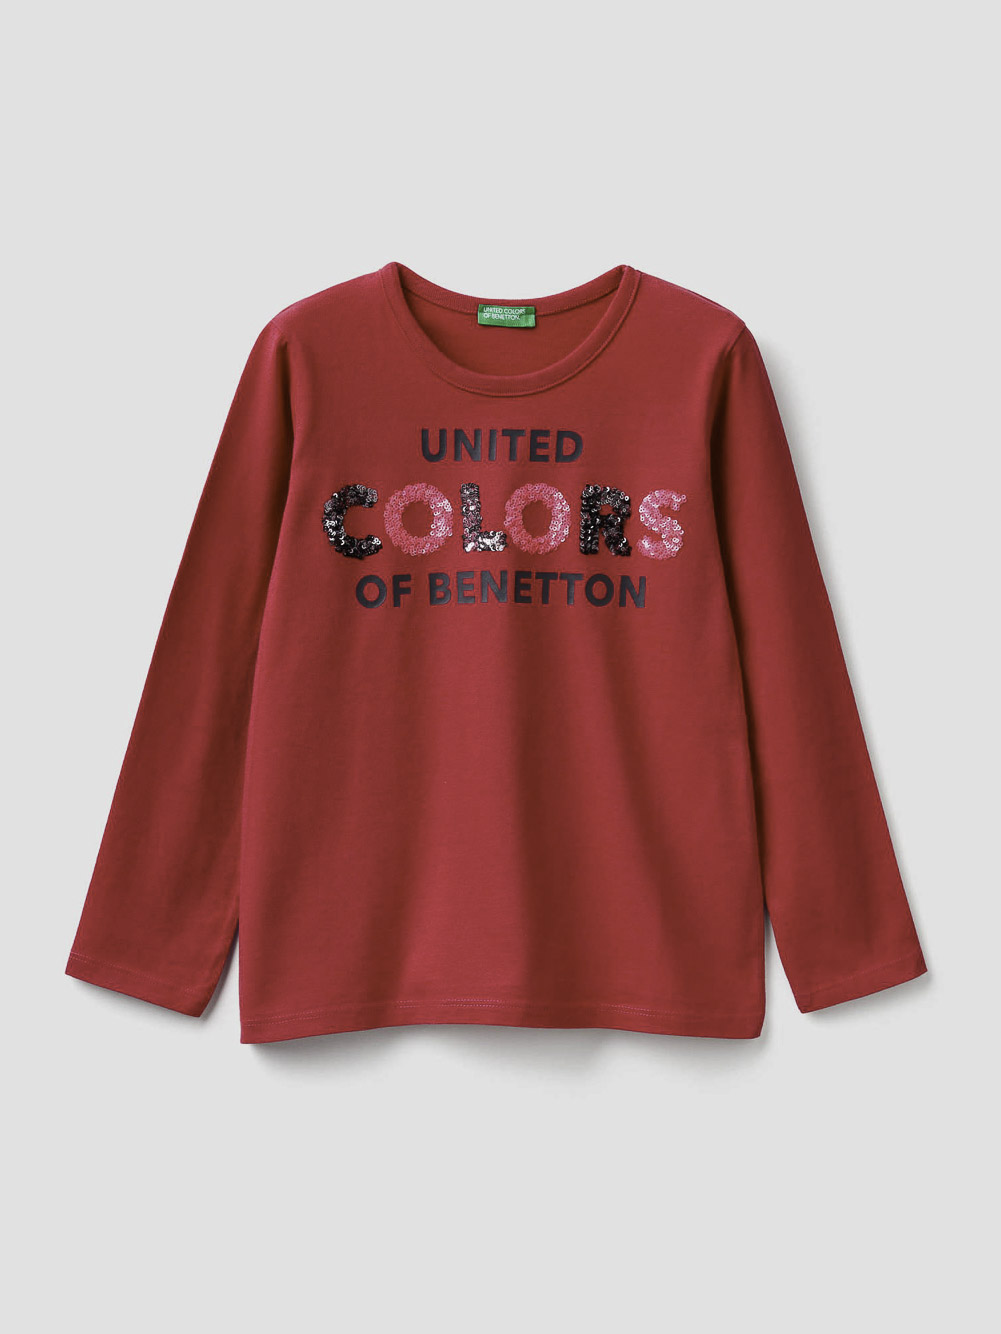 012 BENETTON T-shirt με τύπωμα και παγιέτες 3EG9C14XV 20A143